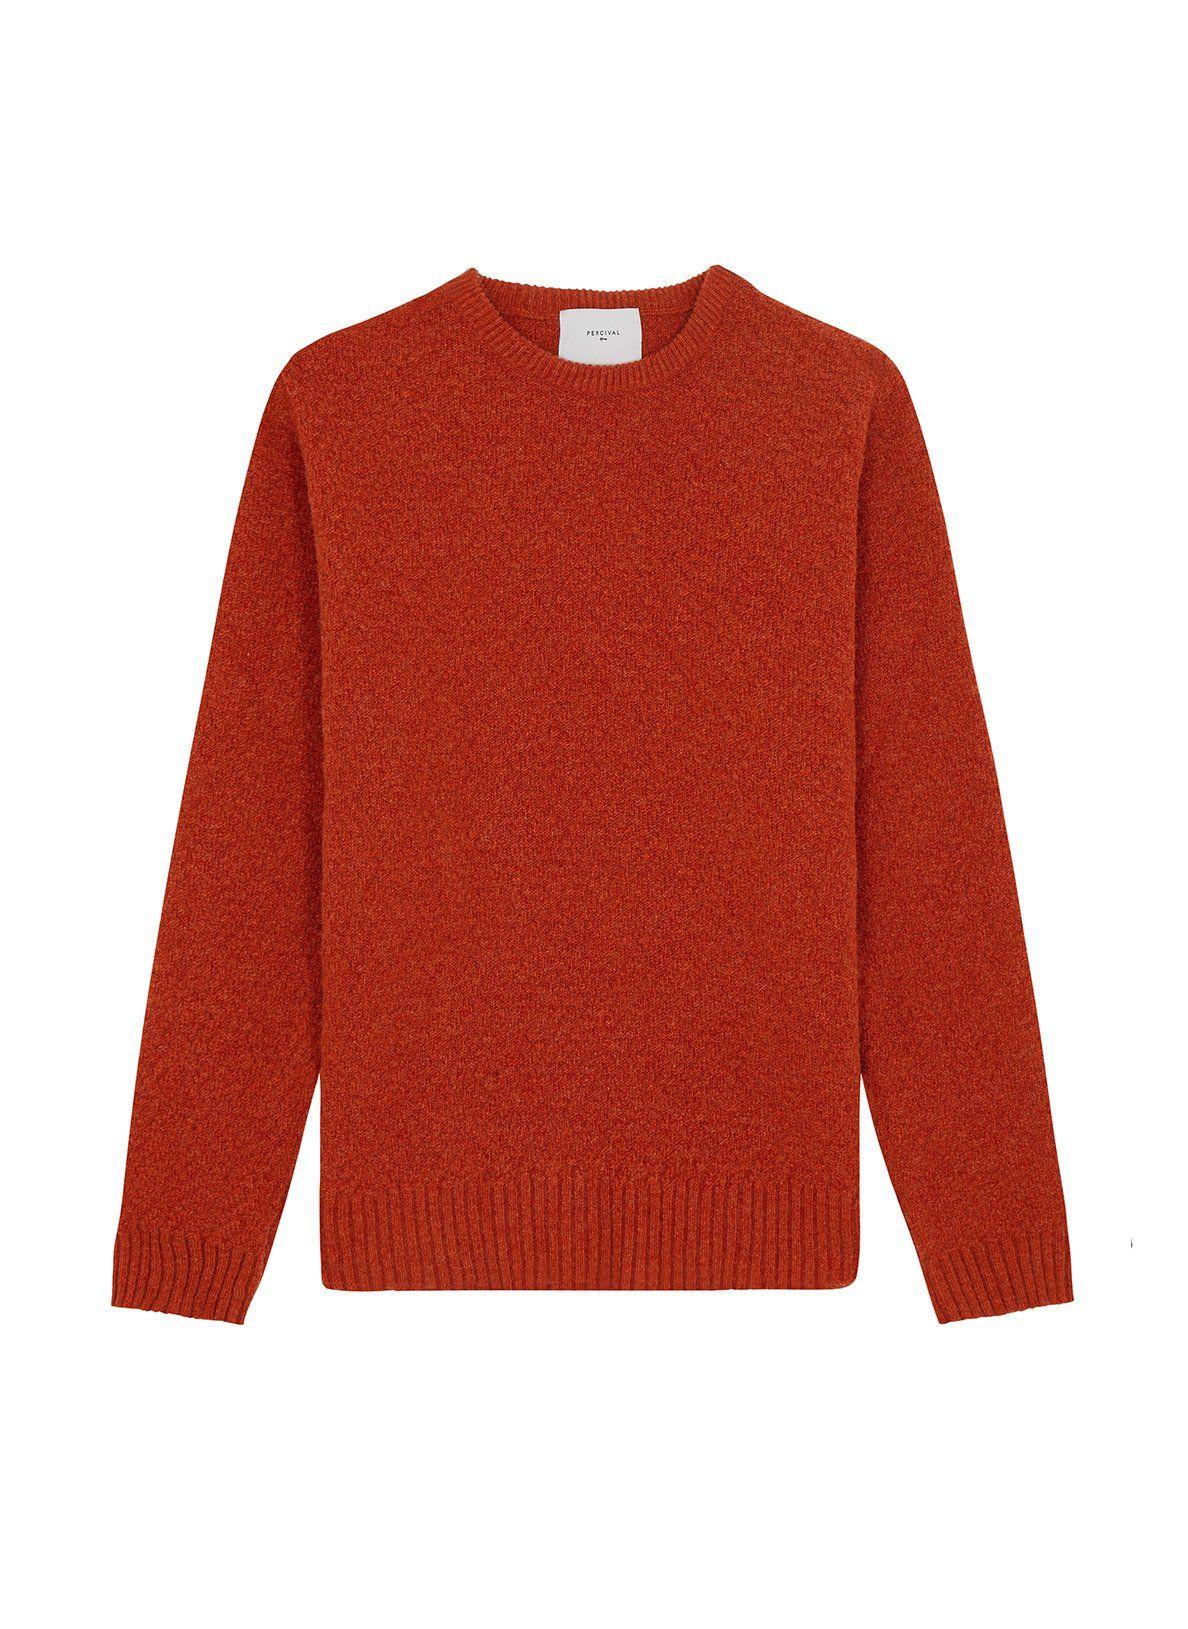 Lambs Wool Tama Weave Burnt Orange Burnt Orange Lambswool Wool [ 1629 x 1188 Pixel ]